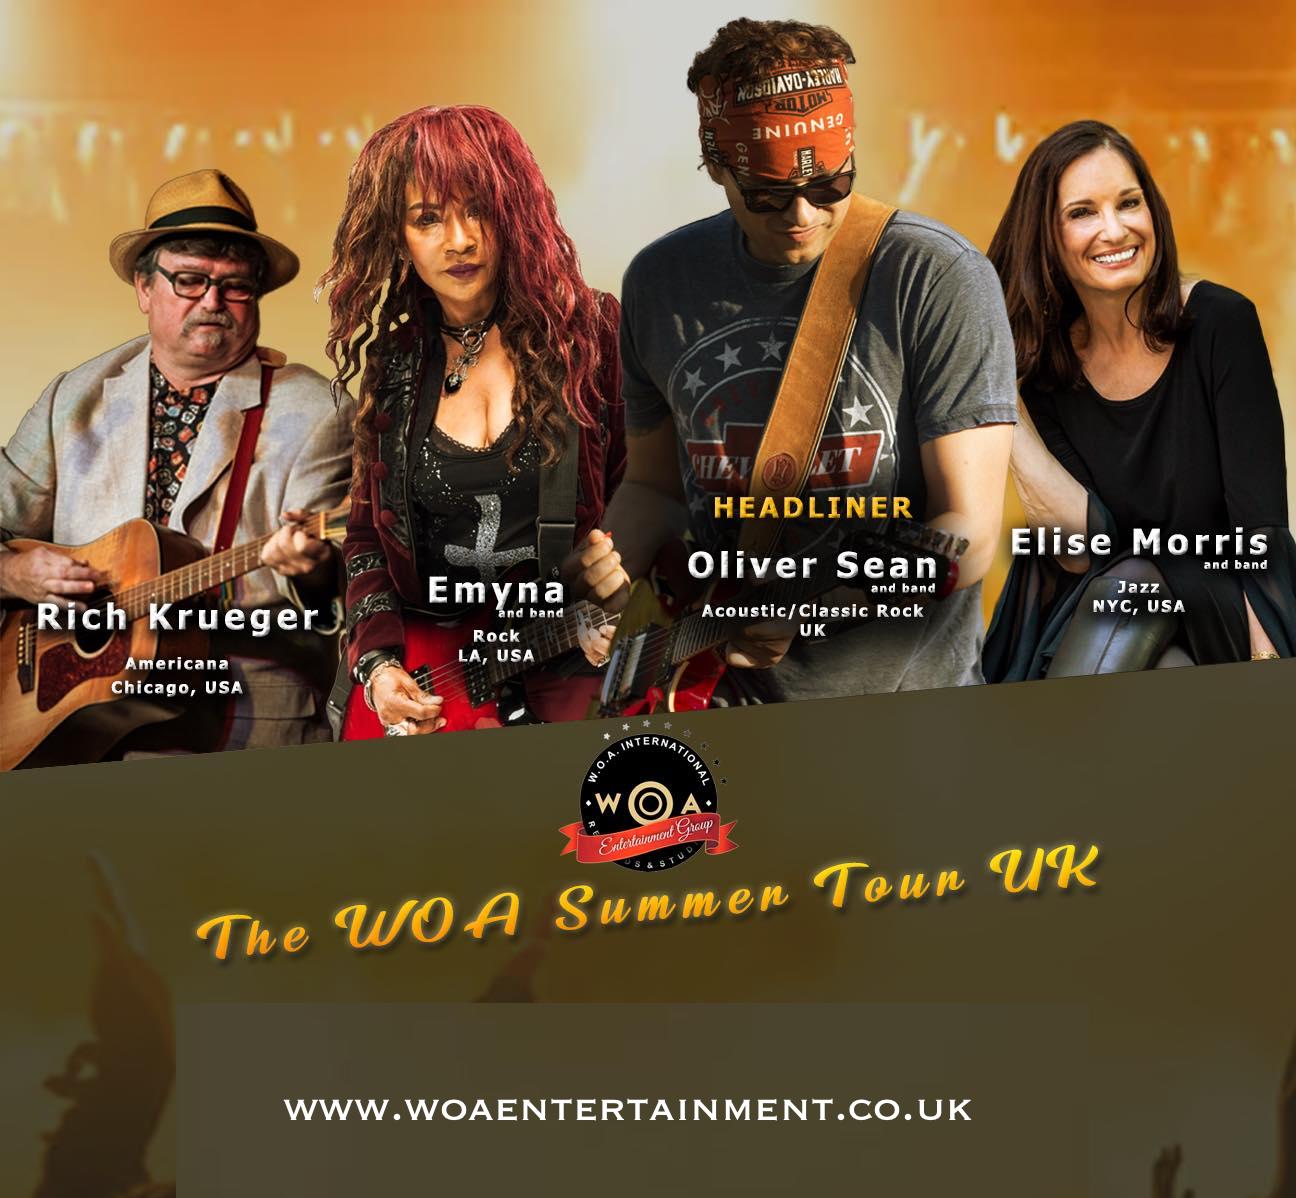 WOA Summer Tour UK 2019